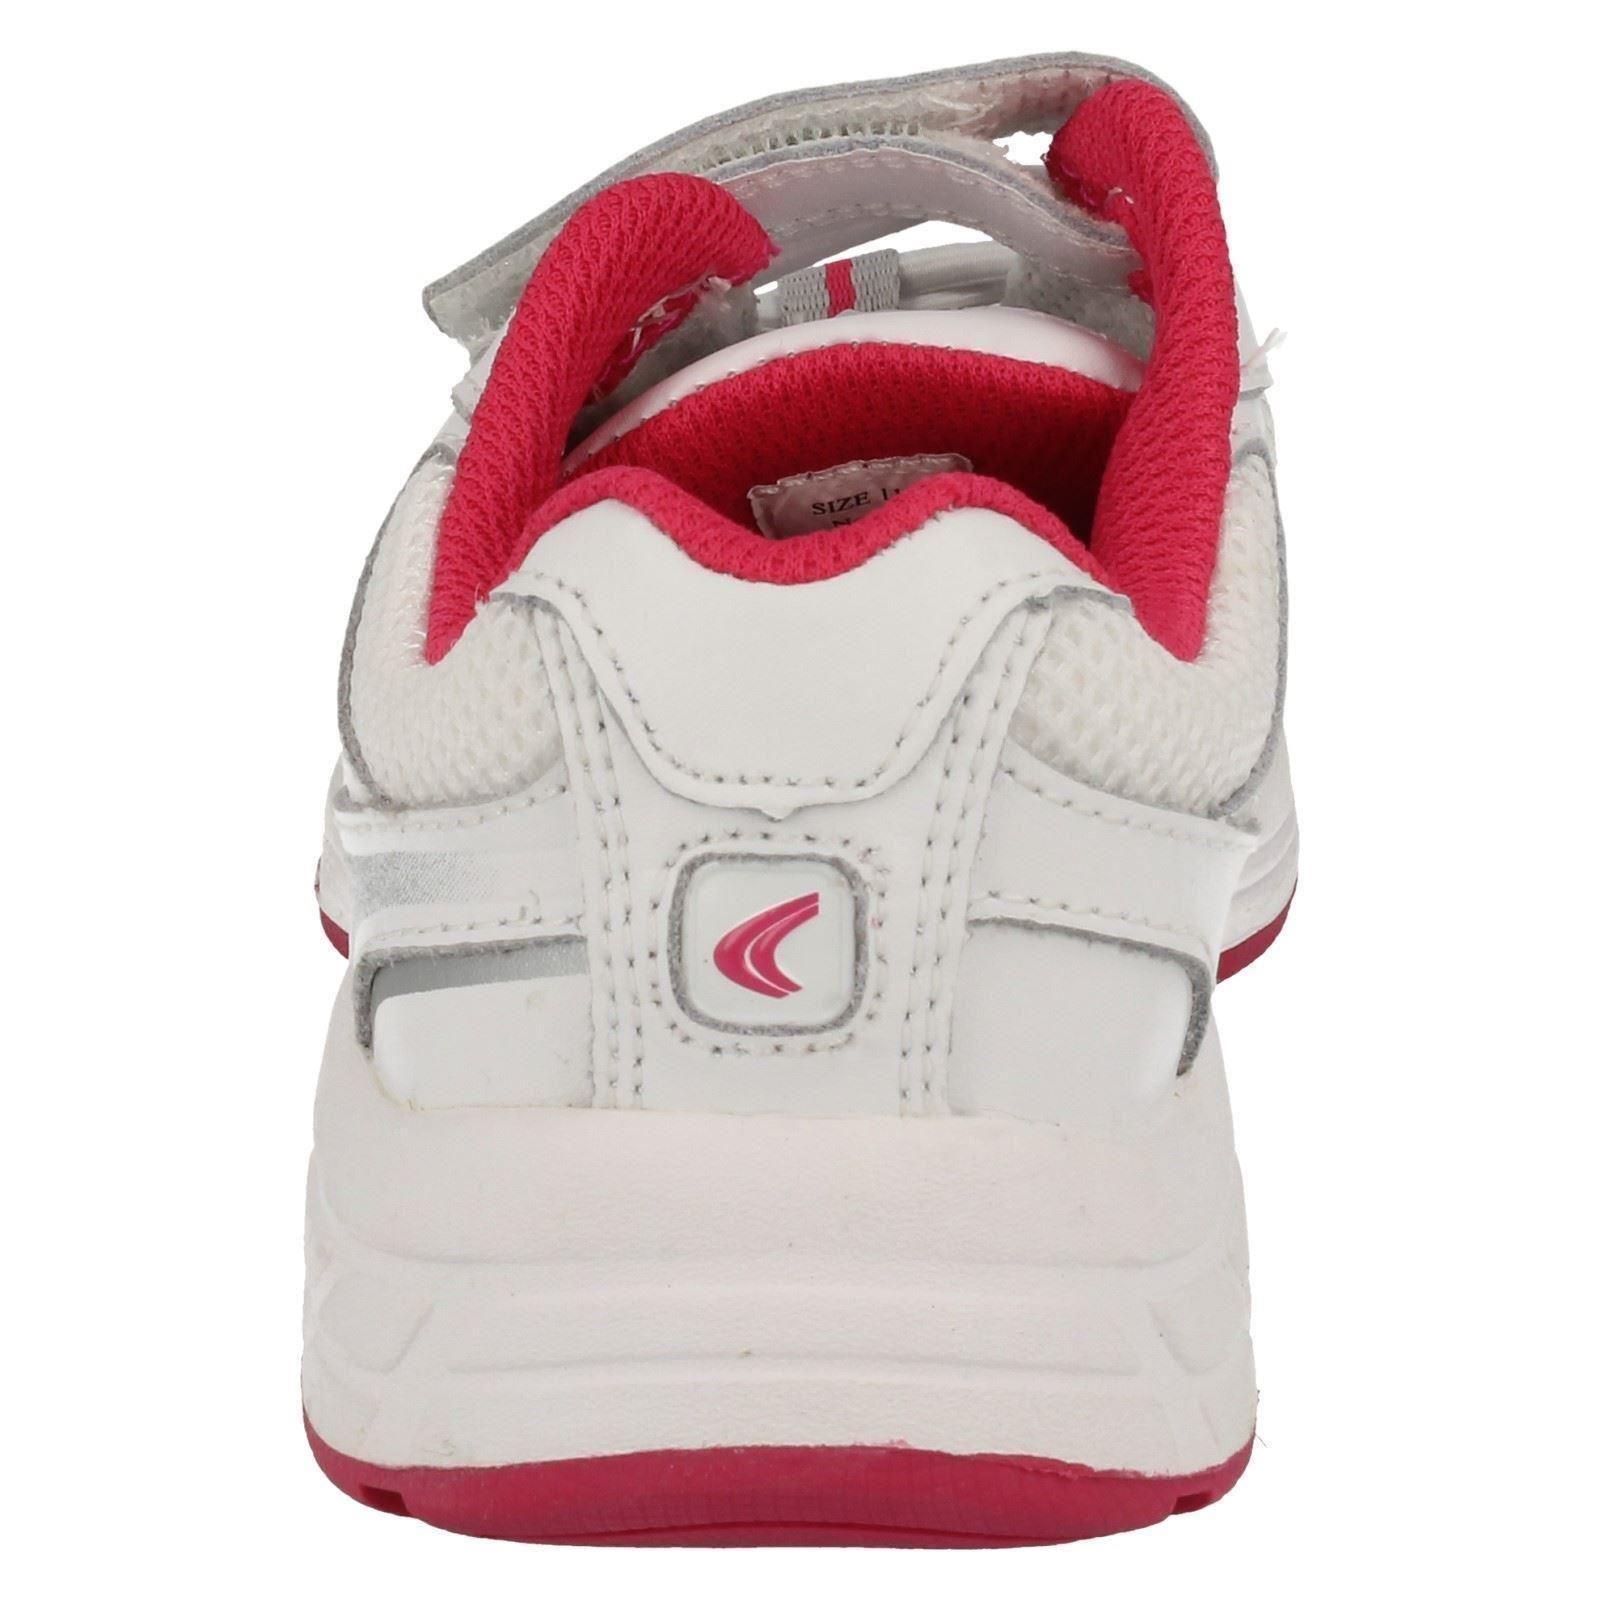 Girls Clarks Trainers Alert Style Jump-W